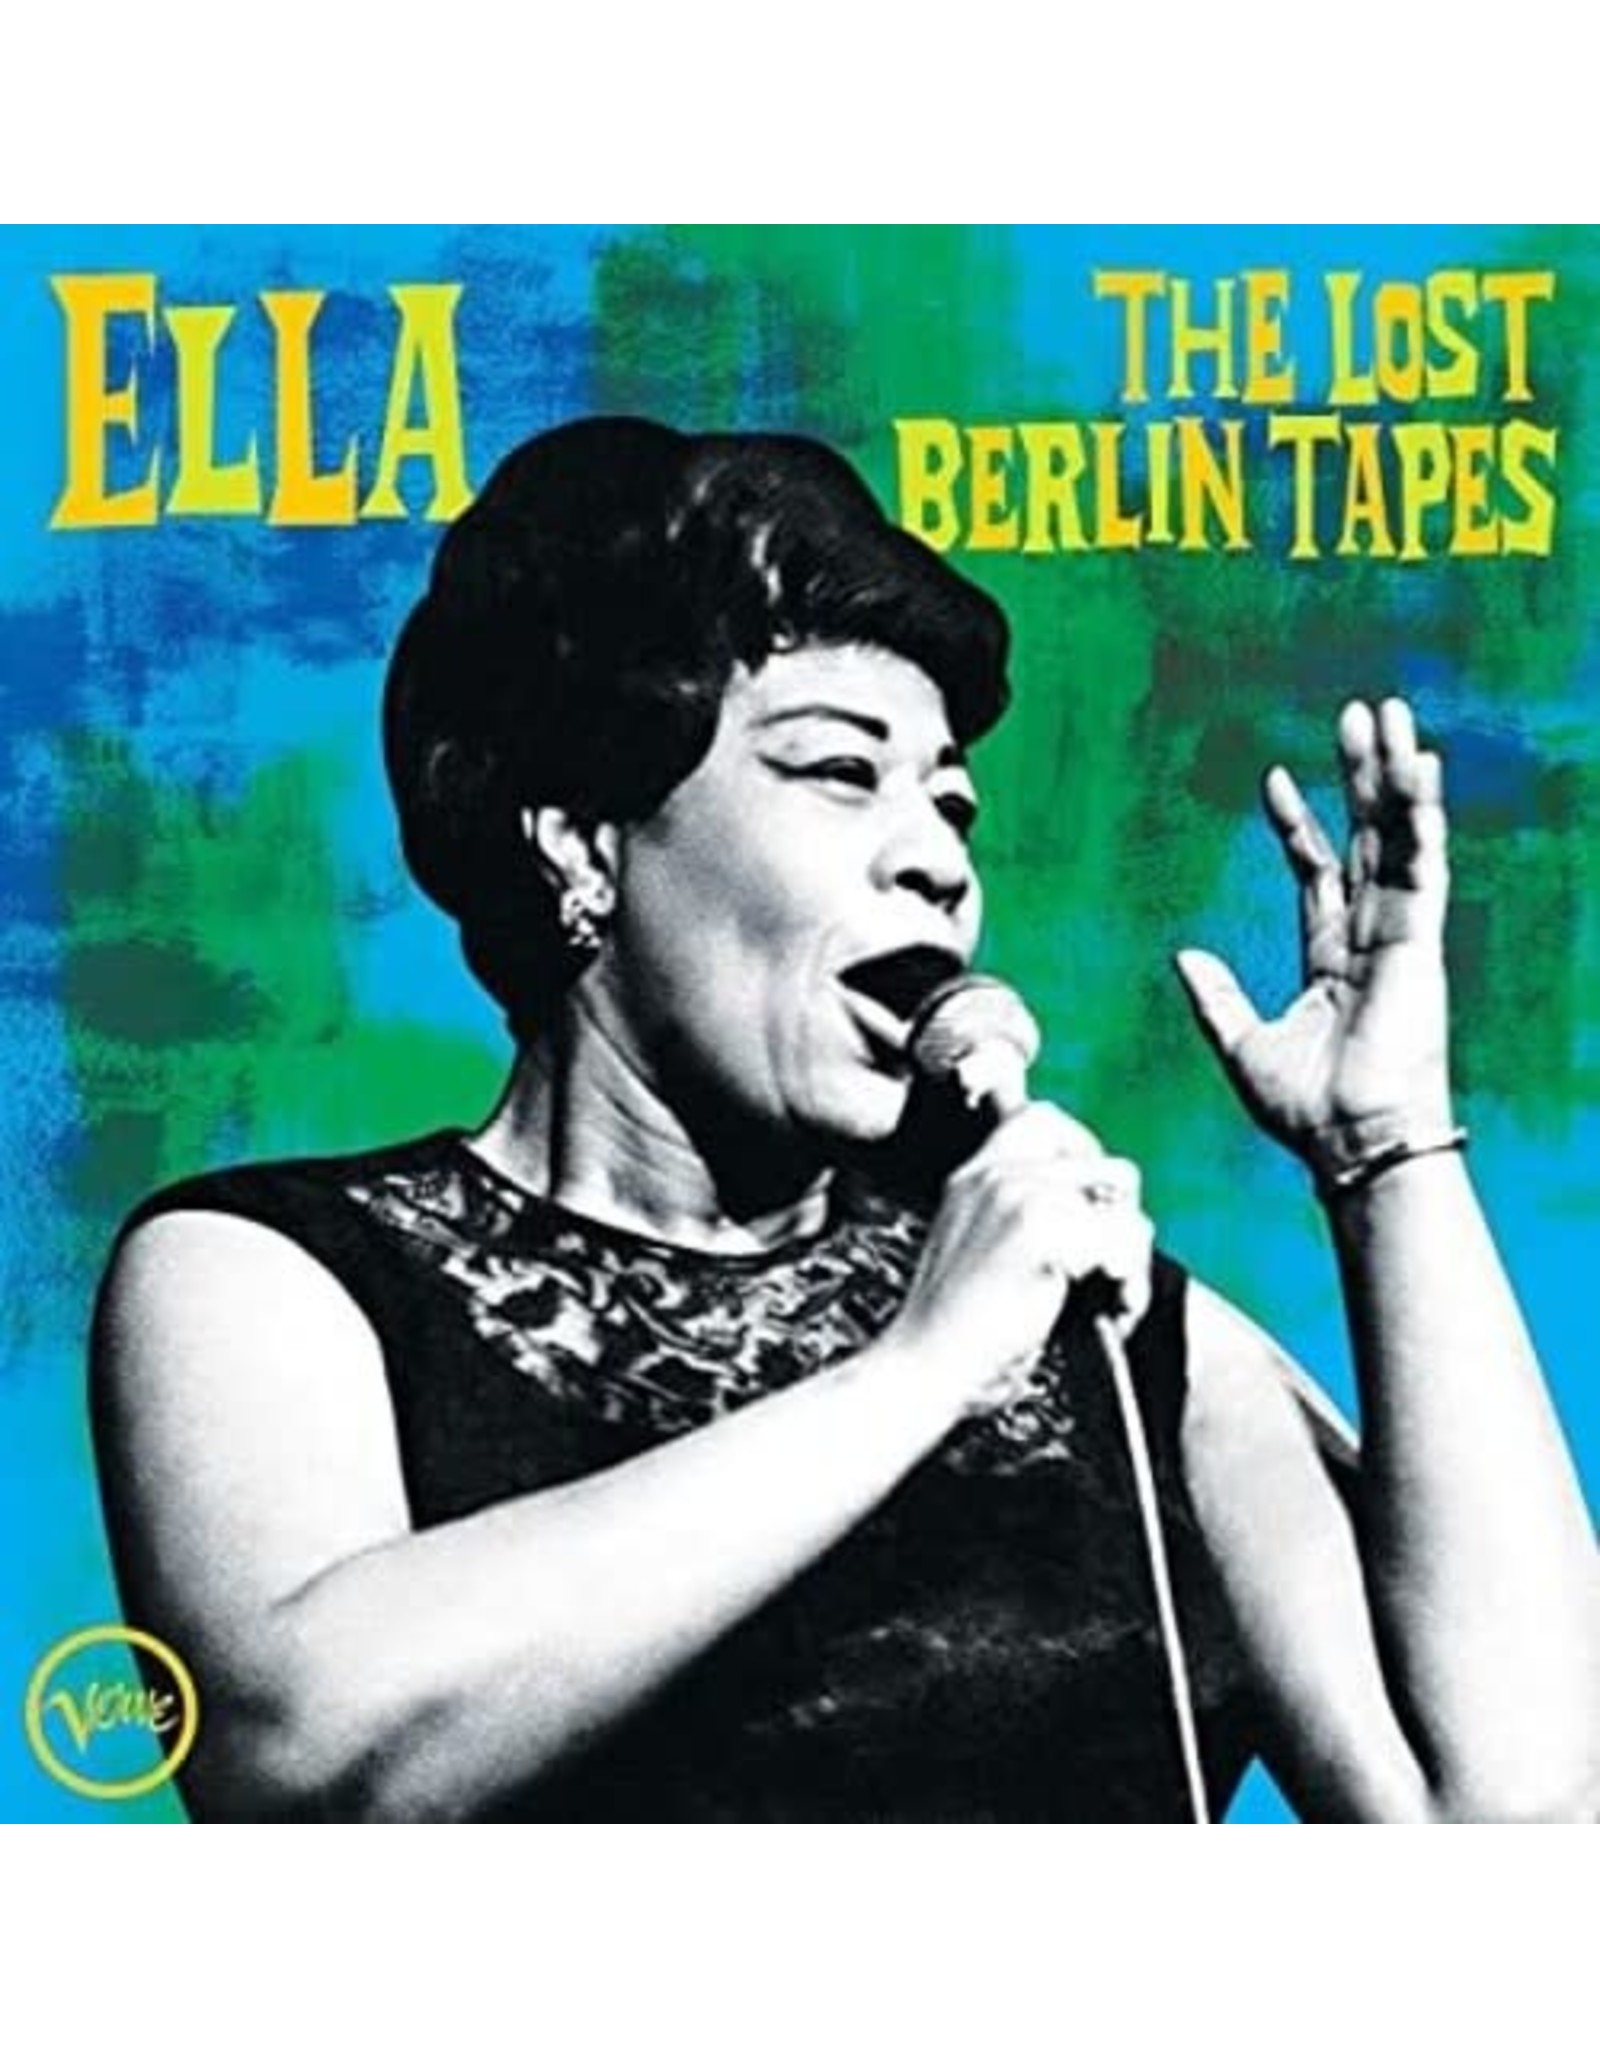 New Vinyl Ella Fitzgerald - The Lost Berlin Tapes 2LP